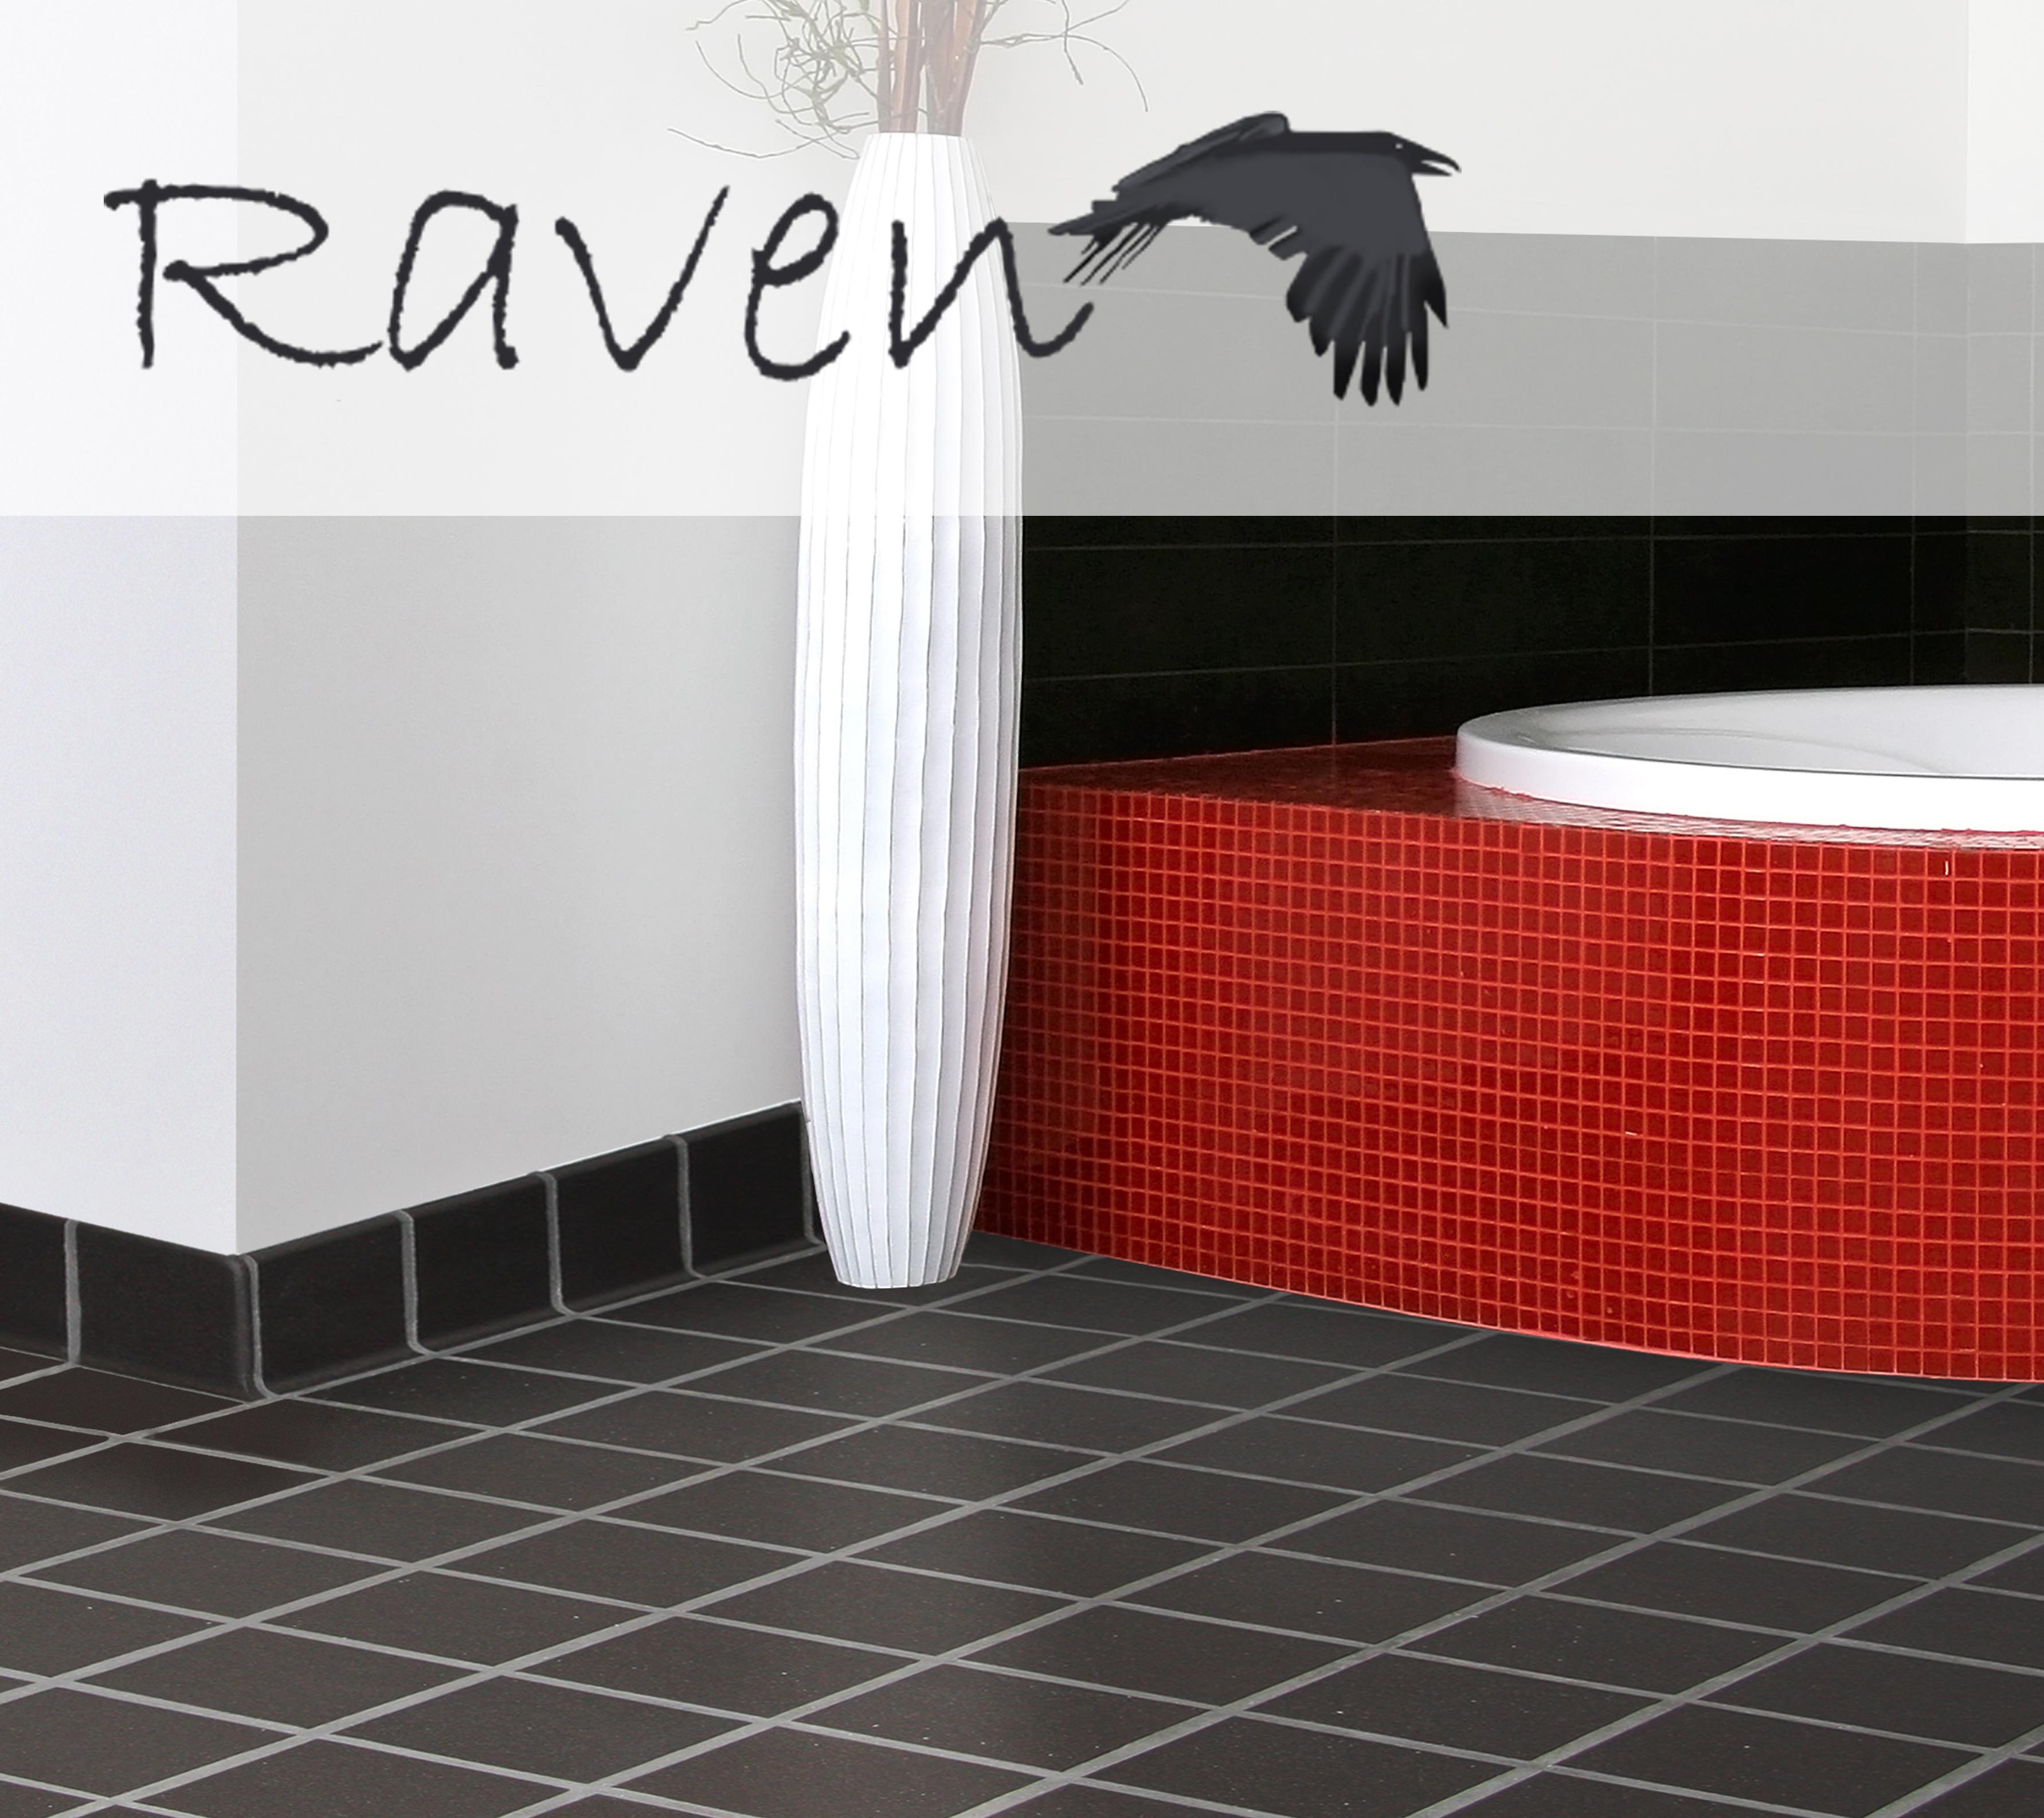 Beautiful 12X12 Cork Floor Tiles Big 16 Ceramic Tile Square 16X32 Ceiling Tiles 18X18 Ceramic Floor Tile Youthful 2 X4 Ceiling Tiles Pink24X24 Ceiling Tiles Ceramic Quarry Tile   Columbialabels